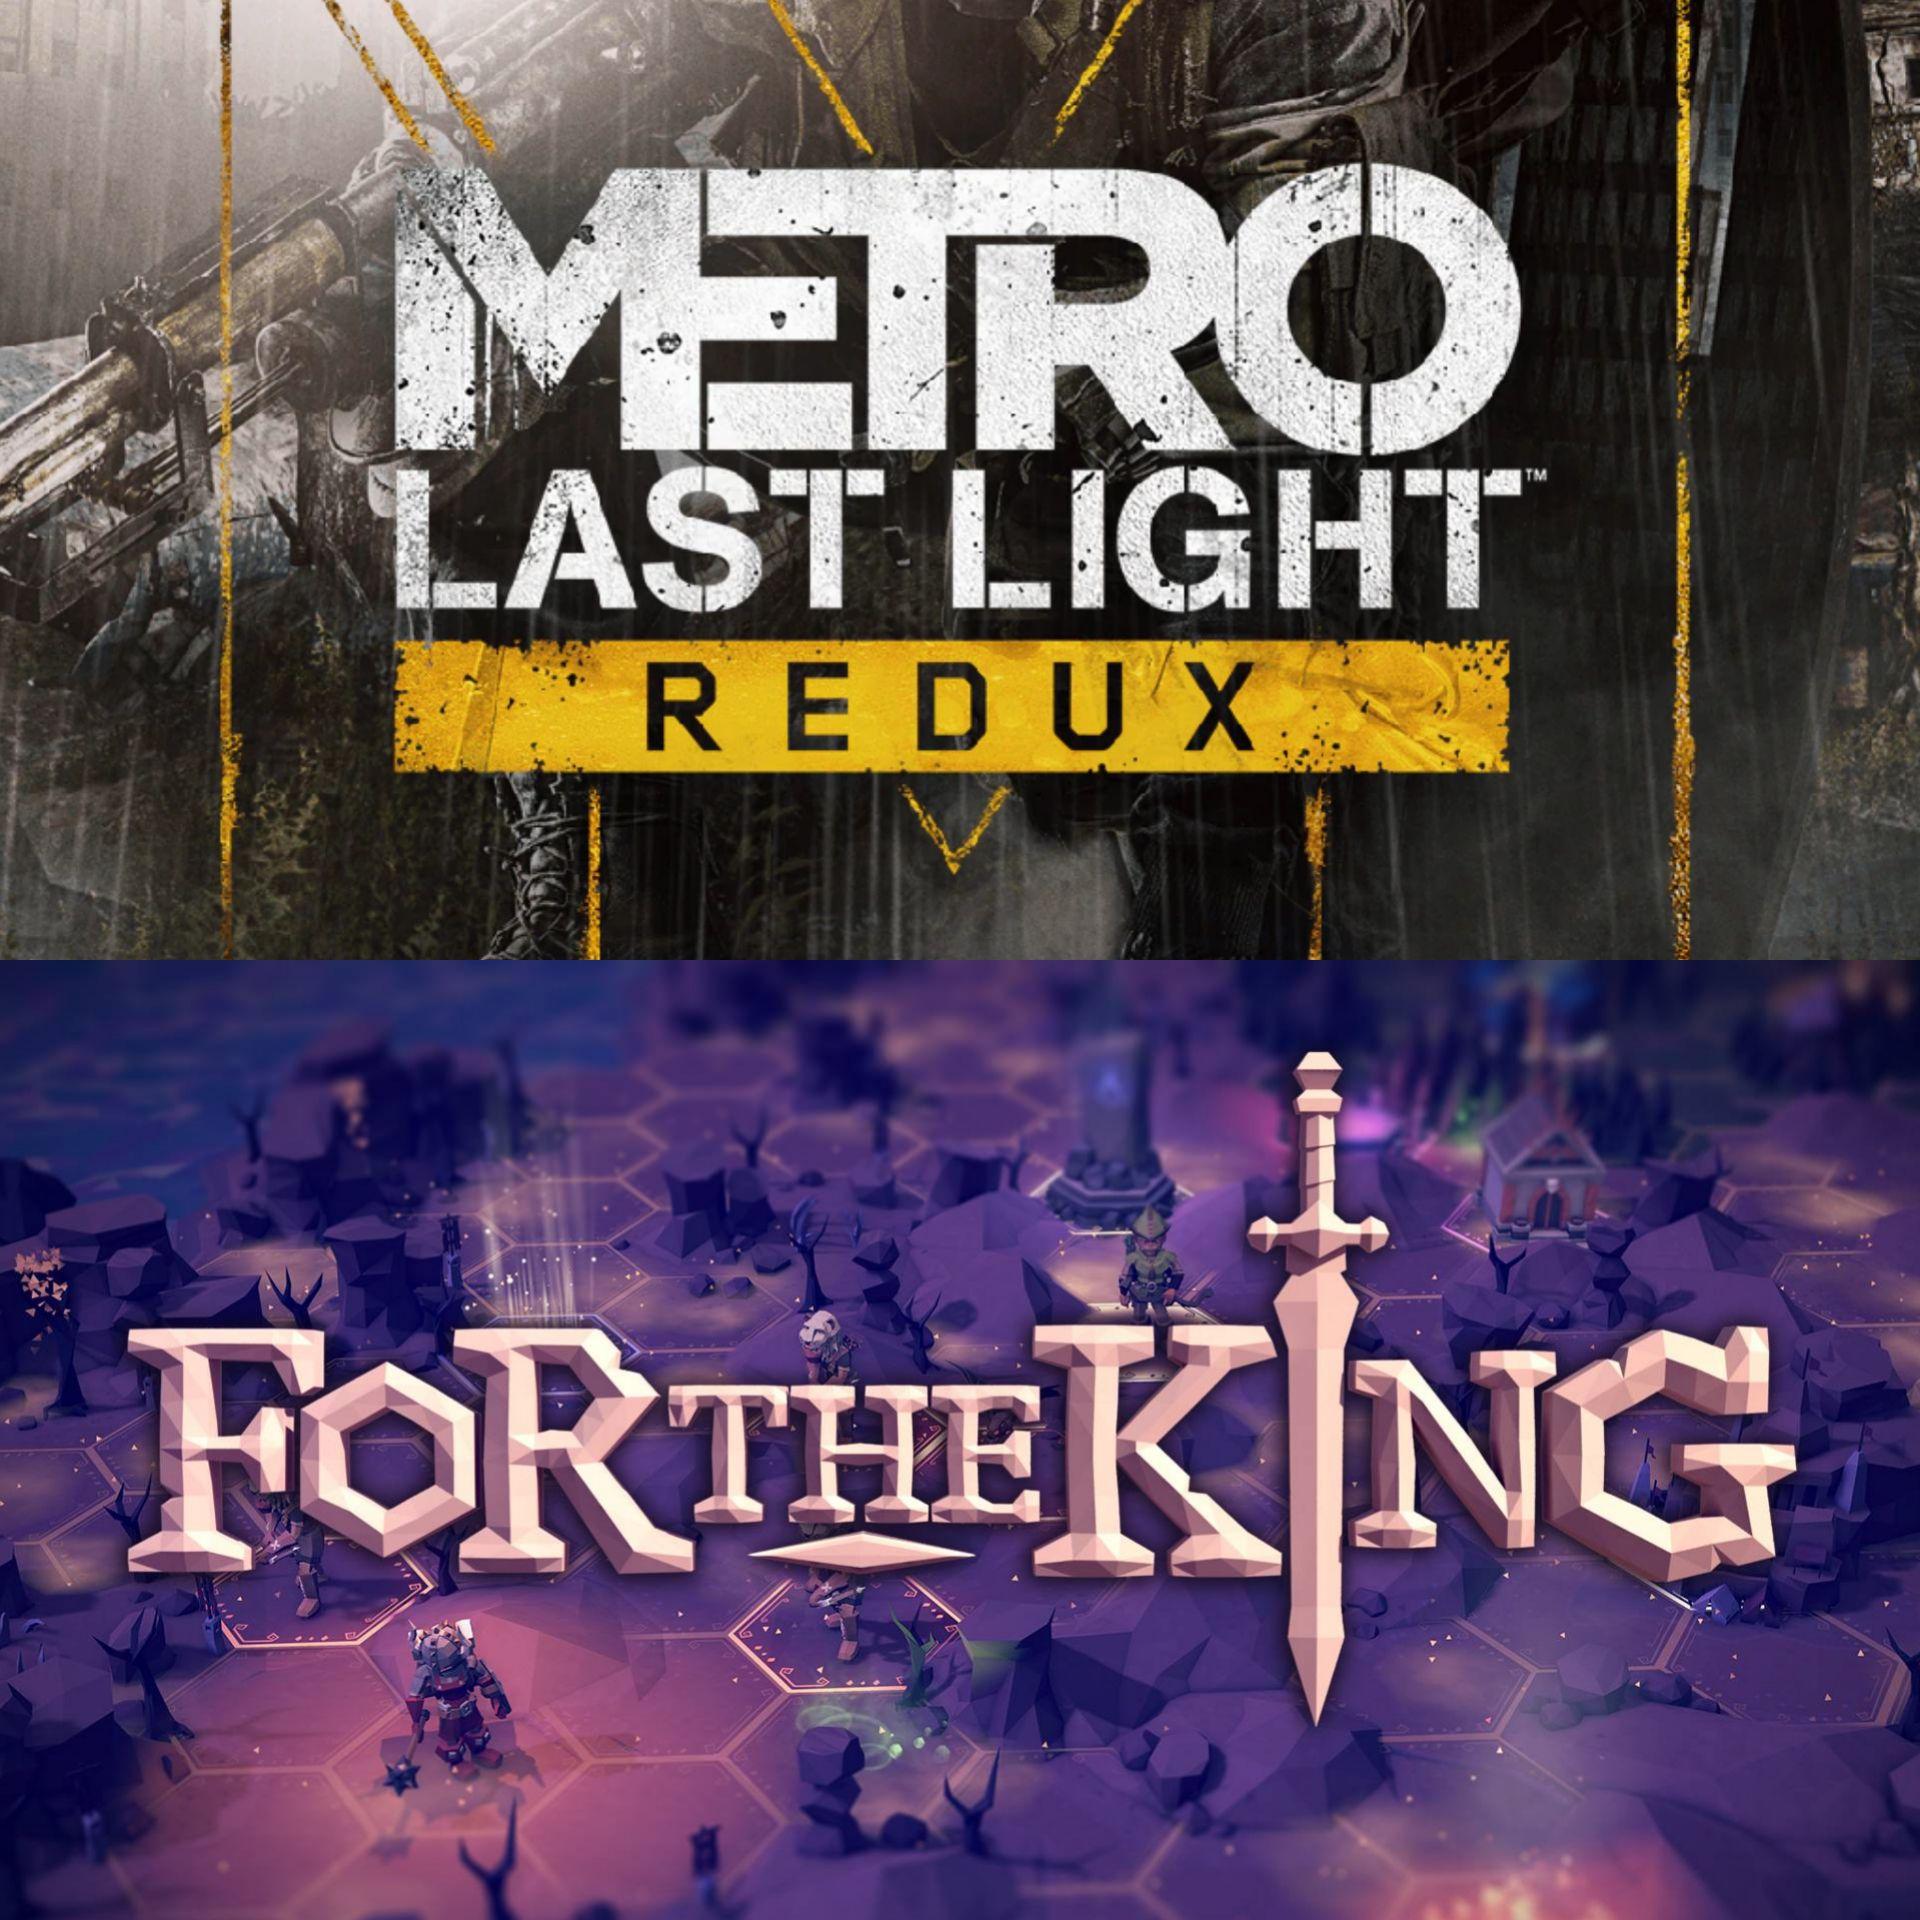 Metro: Last Light Redux & For The King - Kostenlos via Epic Games (04.02 - 11.02)